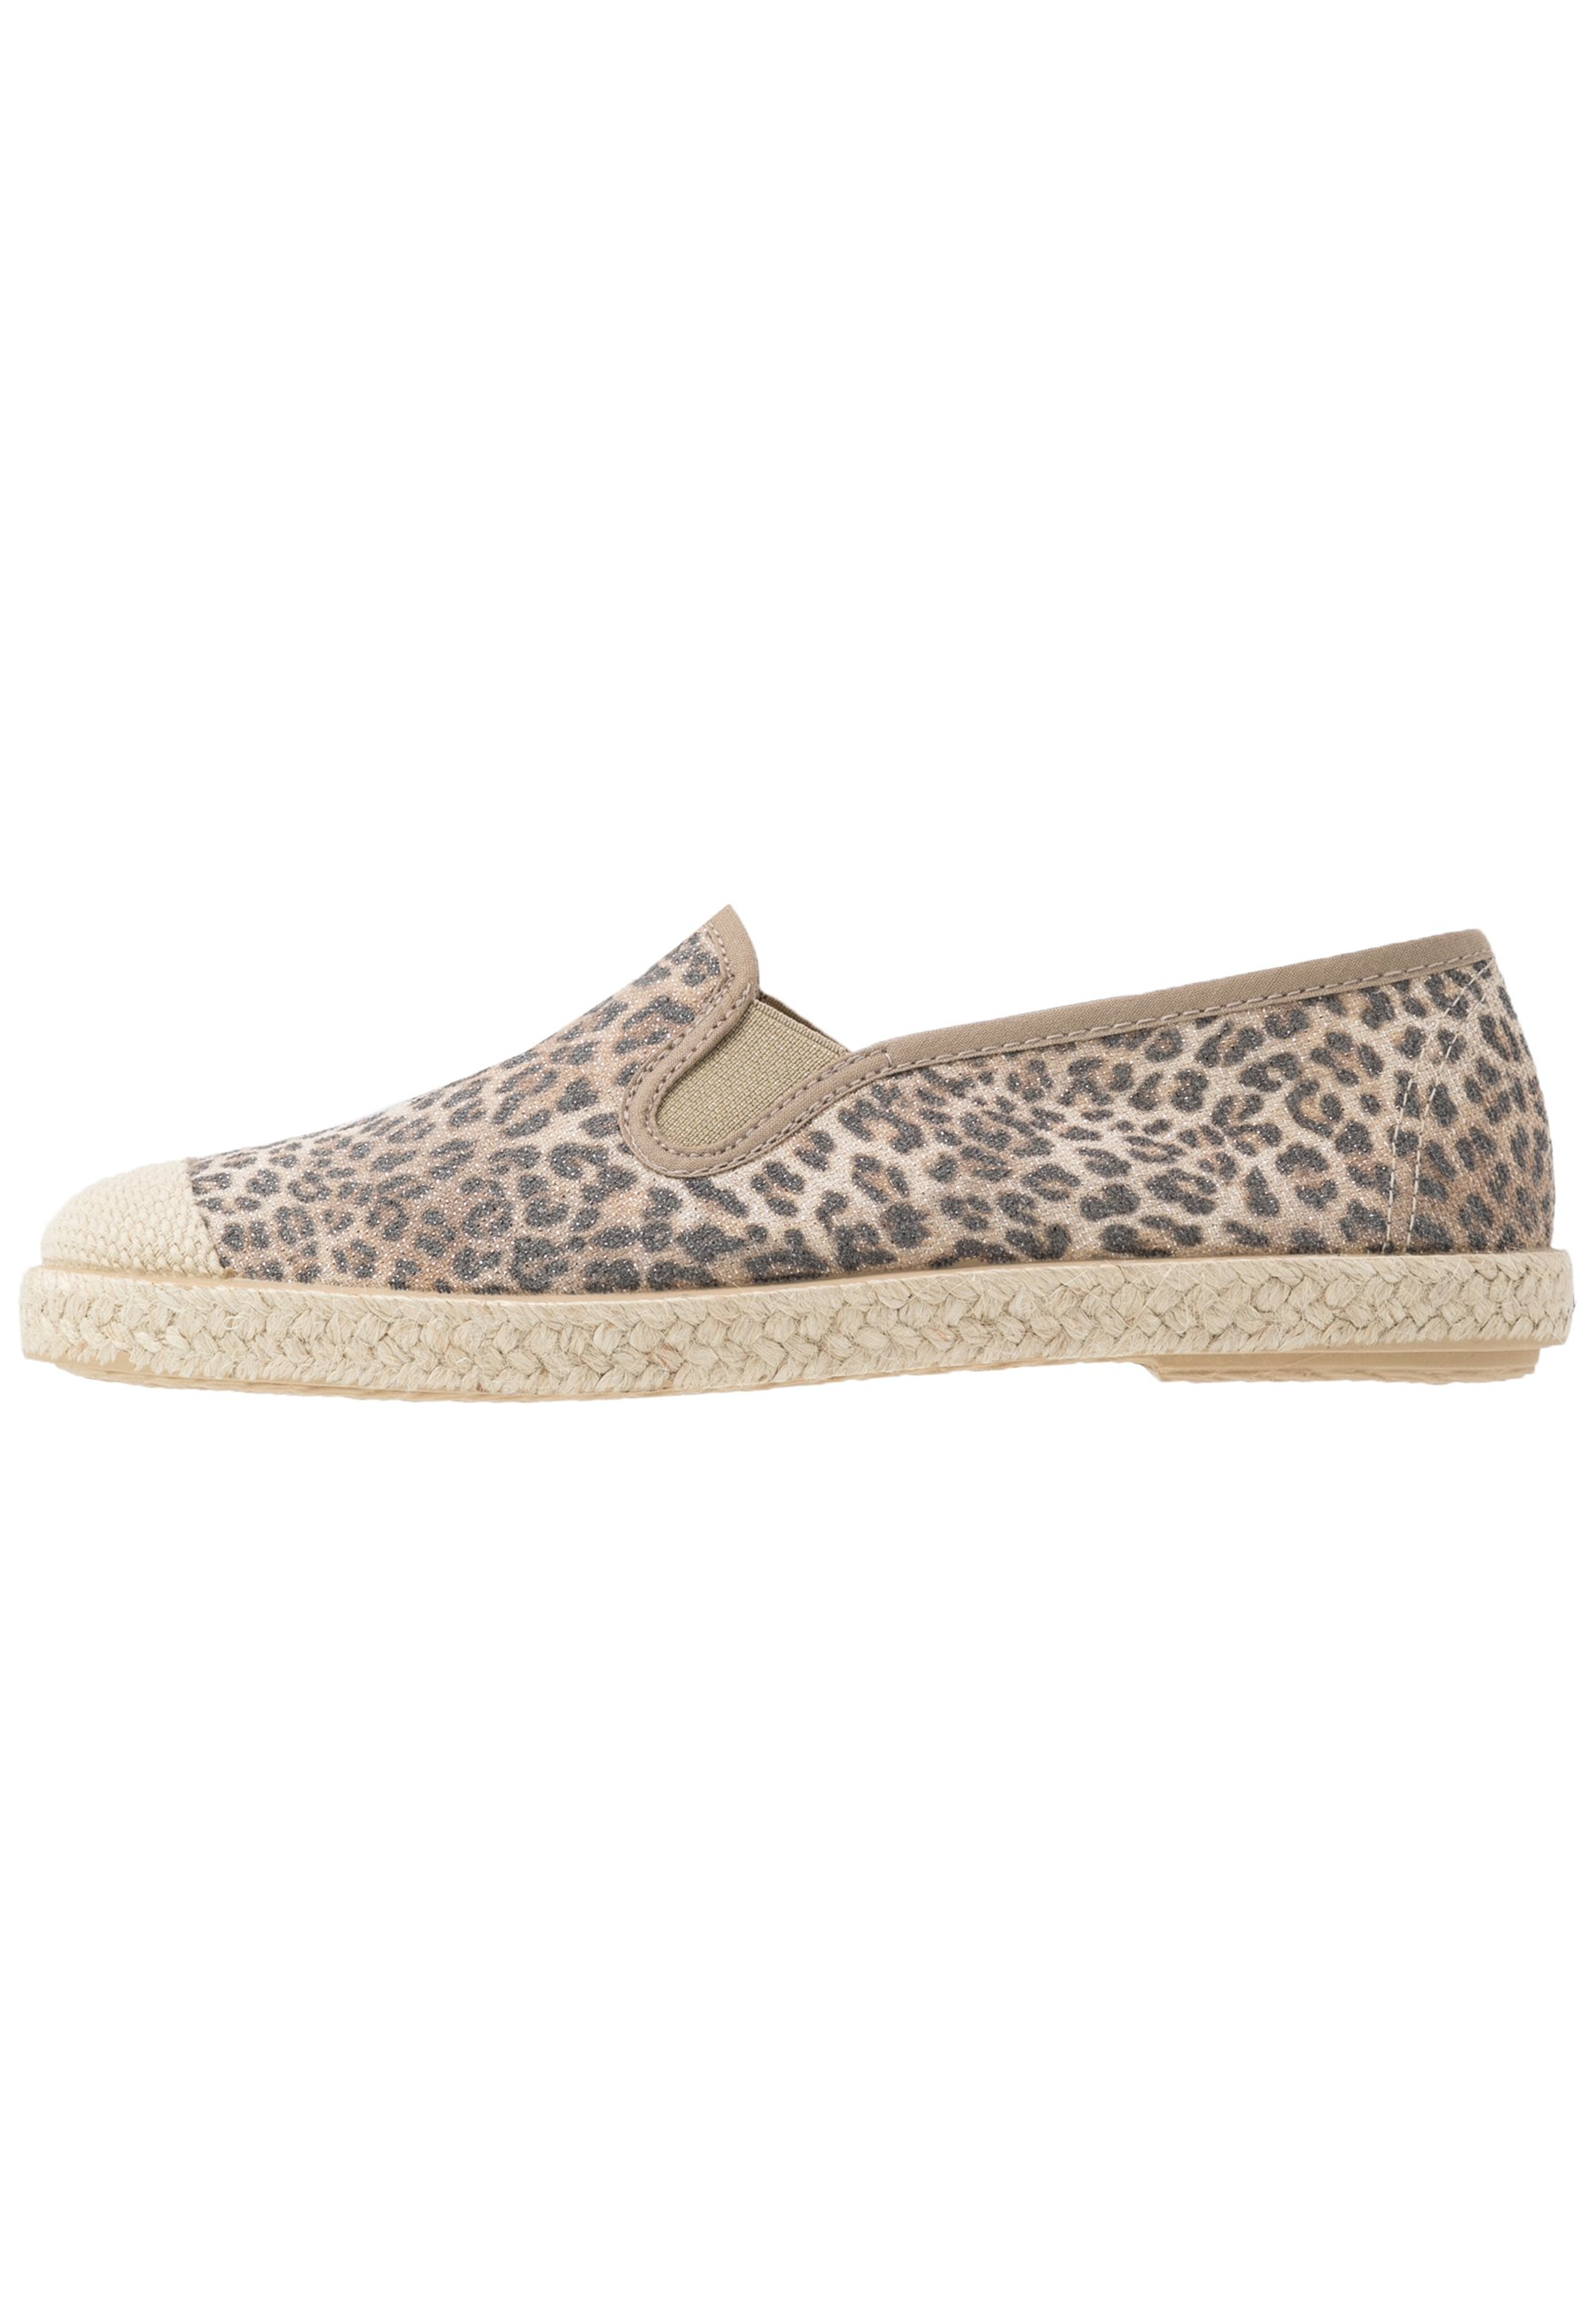 Copenhagen Shoes Florence - Espadrillas Brown hHpvHlF